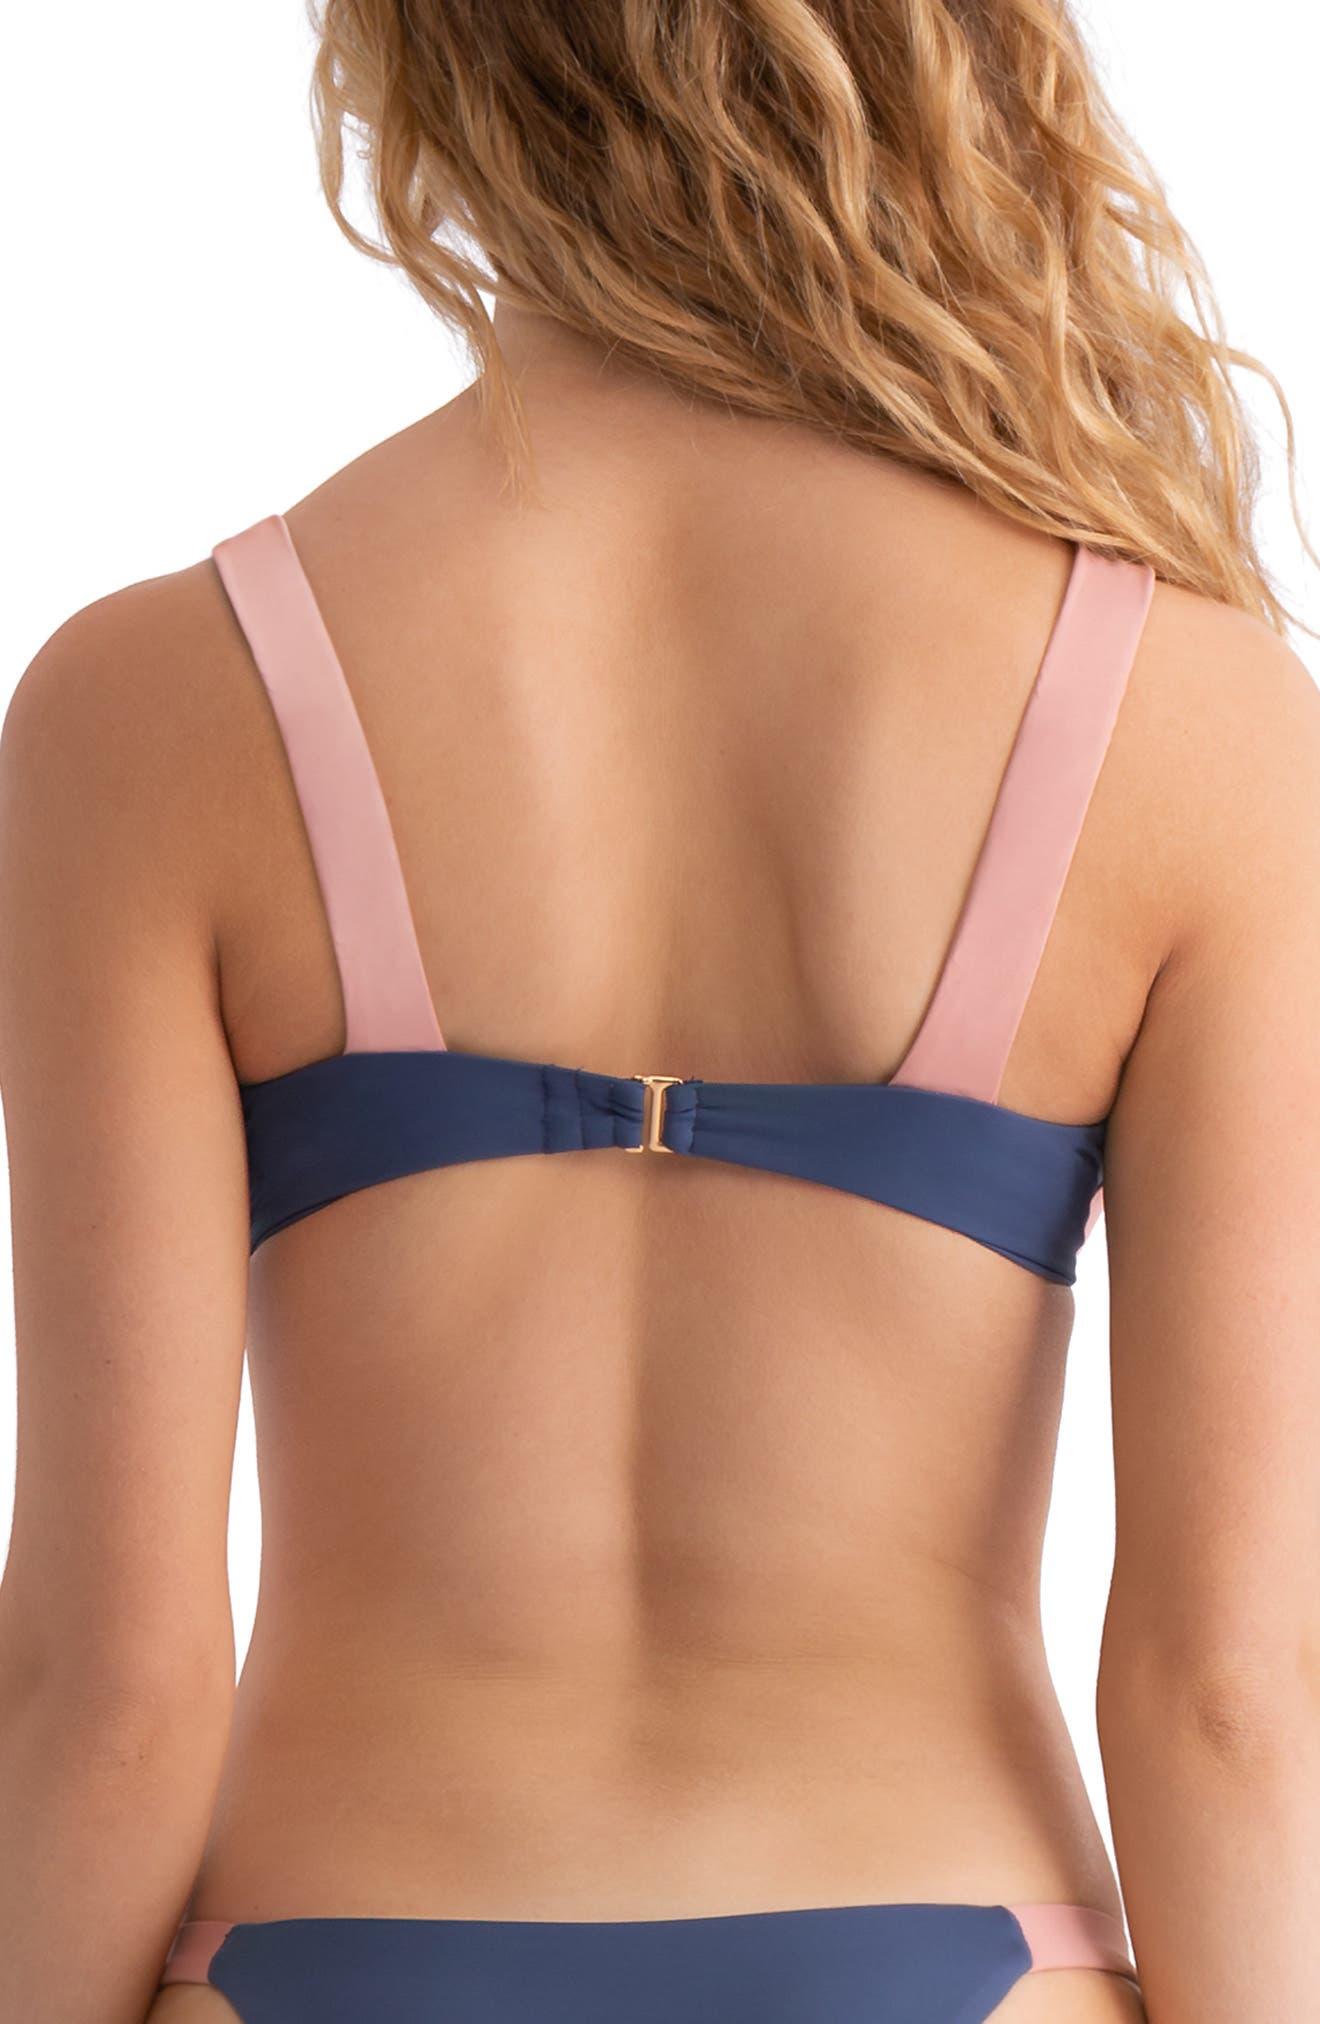 TAVIK, Sawyer Underwire Bikini Top, Alternate thumbnail 2, color, COASTAL BLUE/ DESERT ROSE